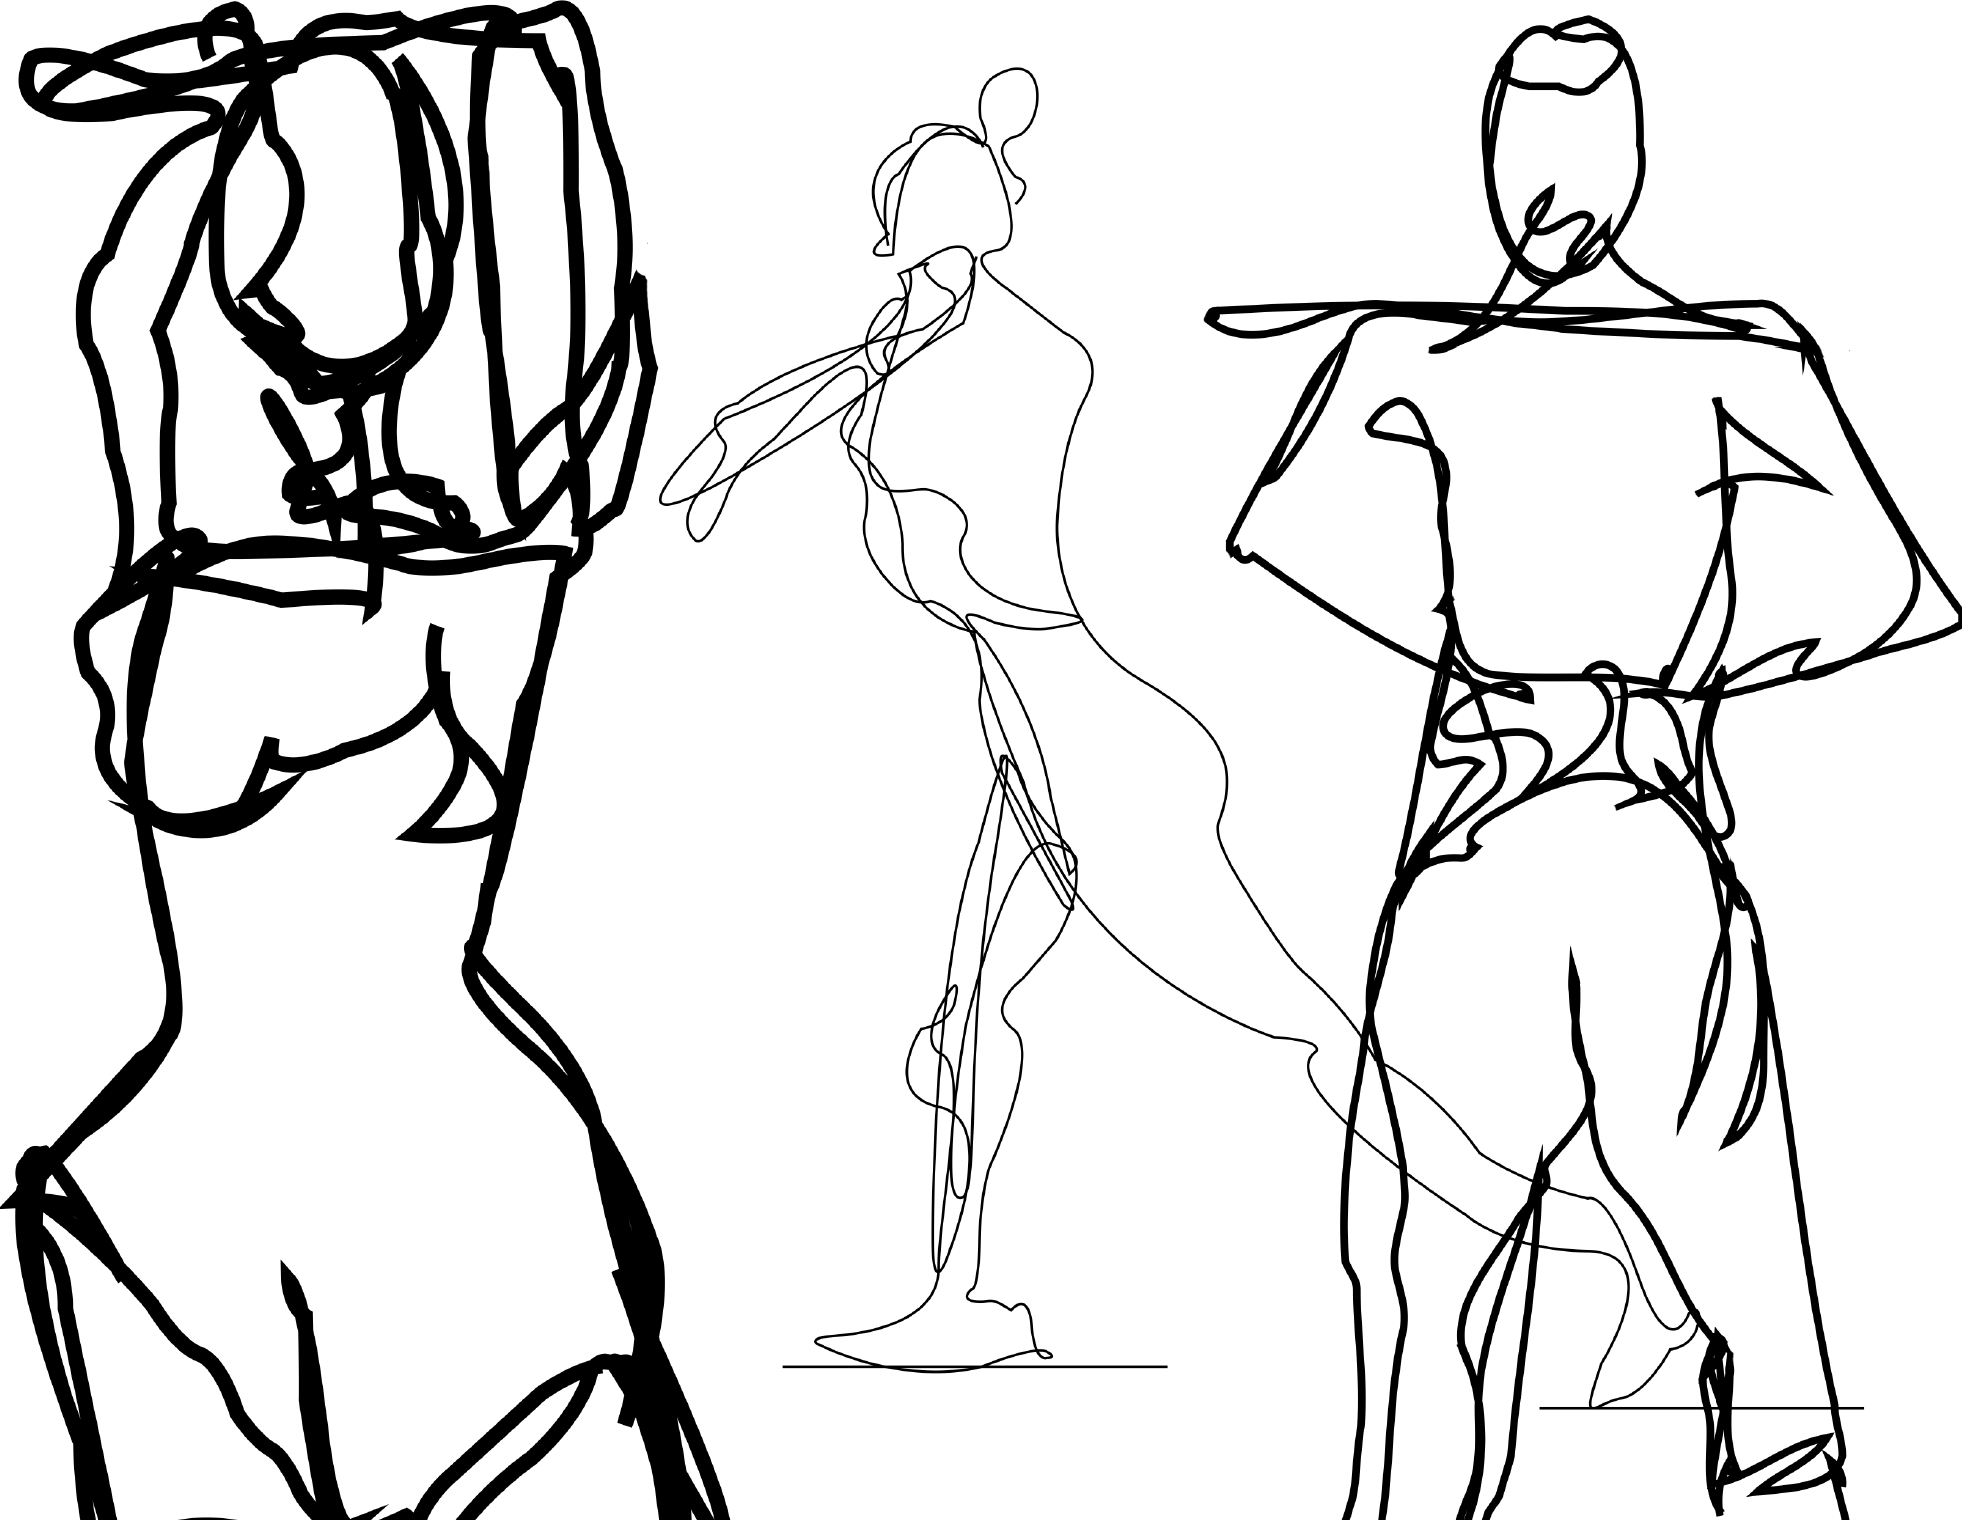 Illustrator Exercise: Contour line drawings (Figure Composition)